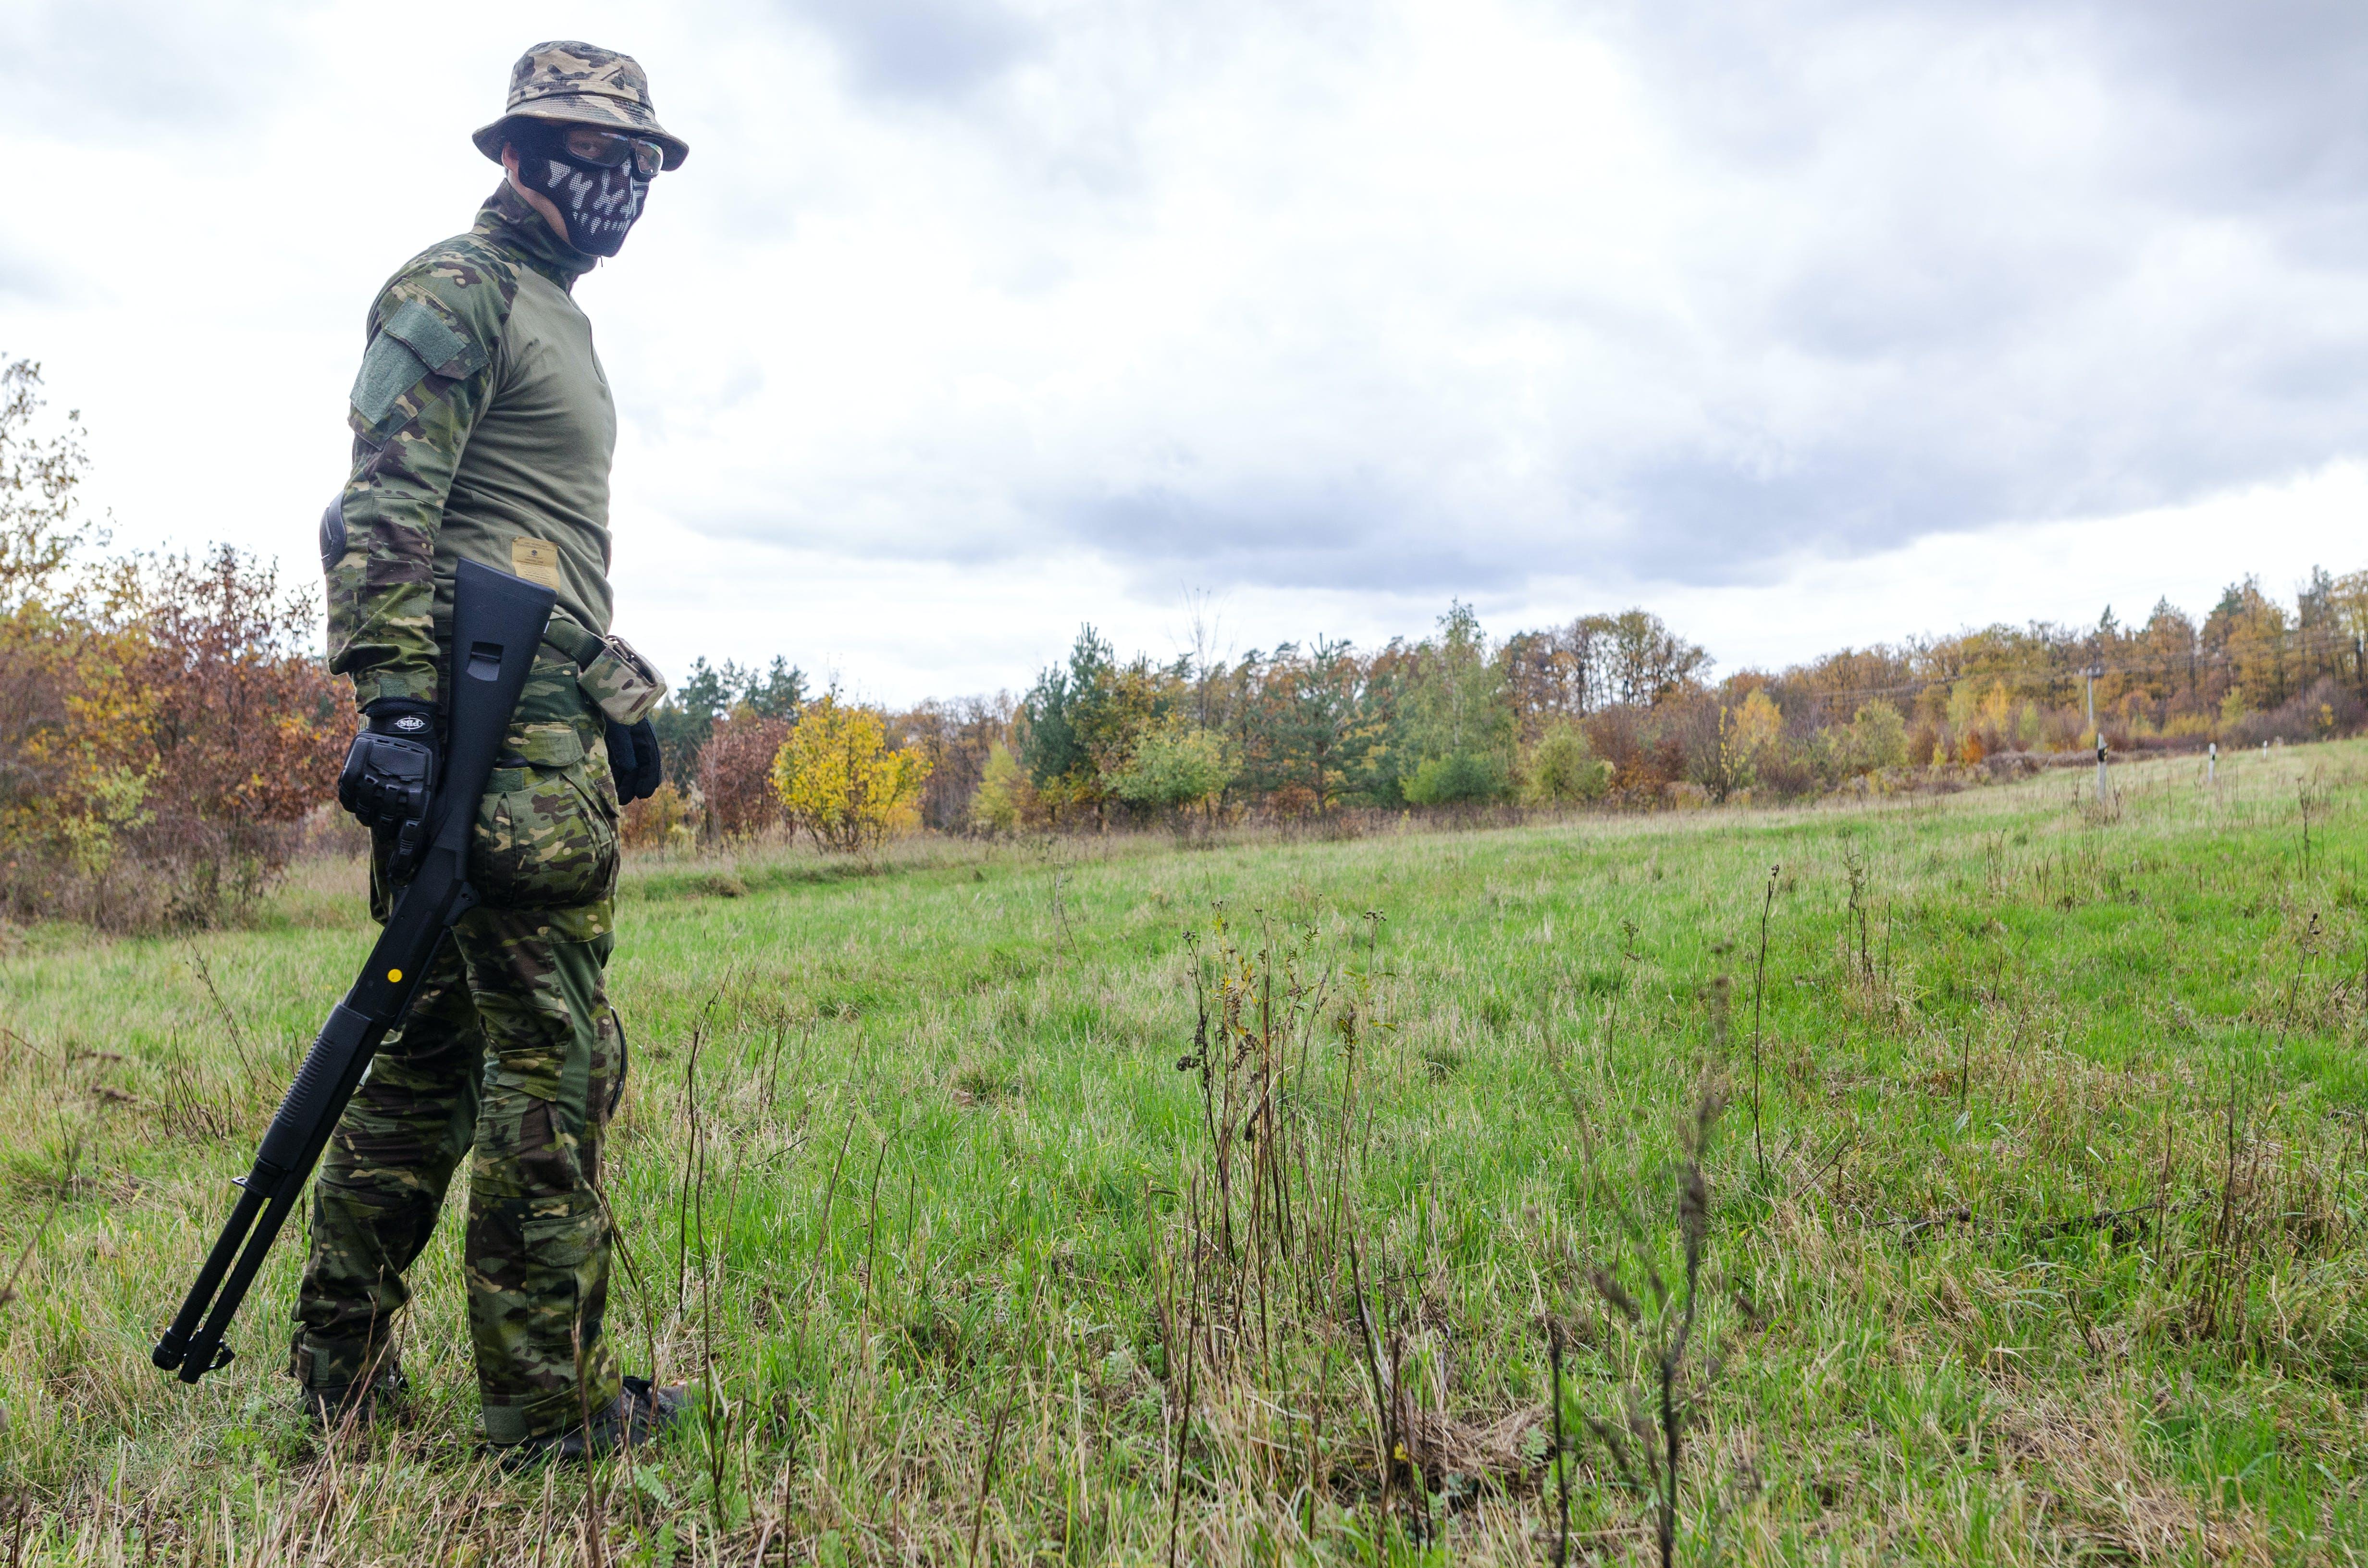 Photo of Man Wearing Green Combat Uniform Holding Rifle